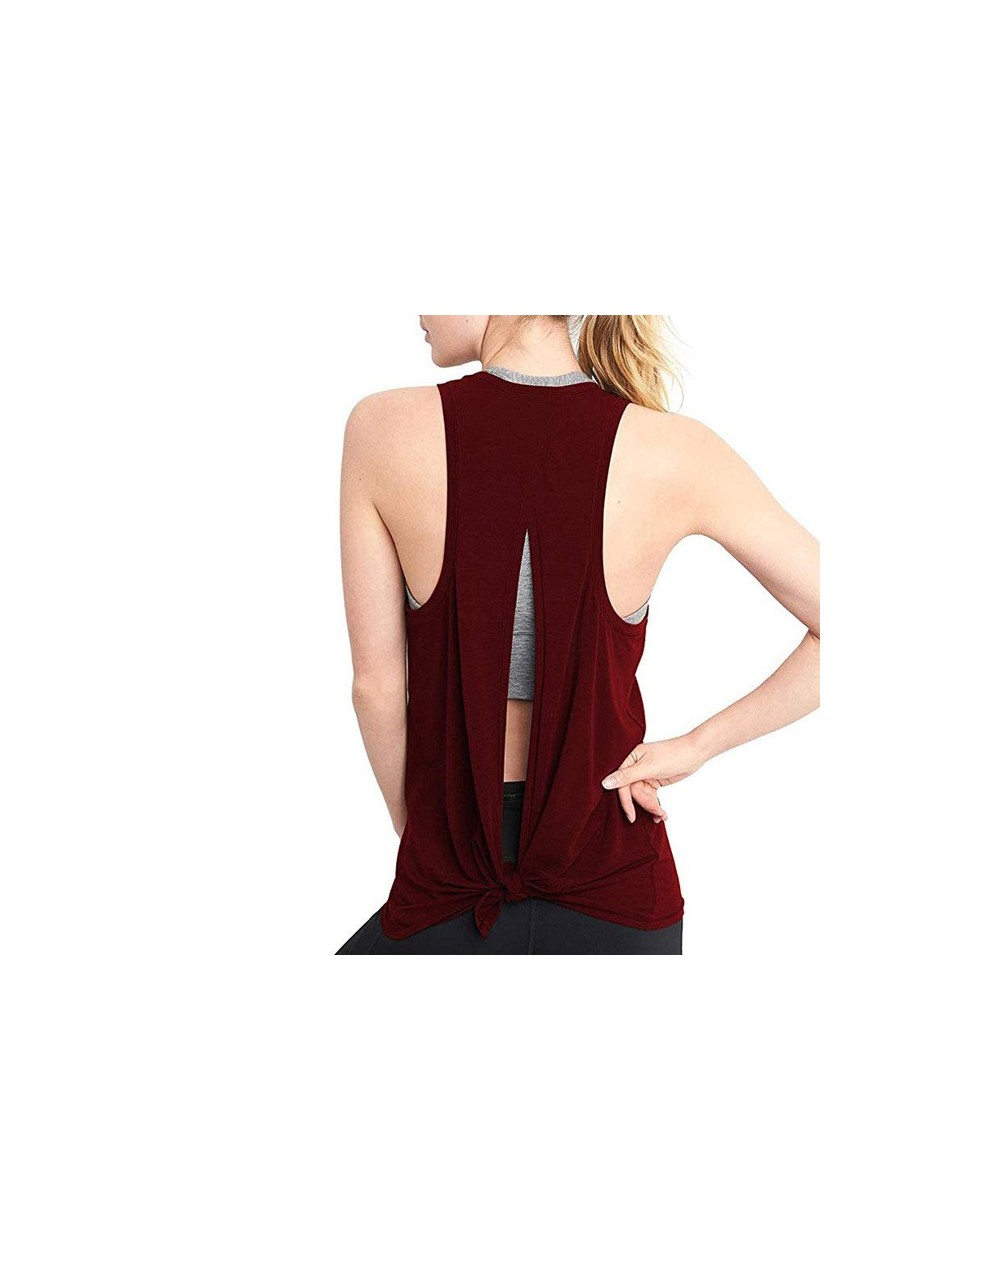 Hot Women Tank Tops Summer Sleeveless O-neck Solid Hollow Back T-shirt hh88 - Red - 5F111219311181-2